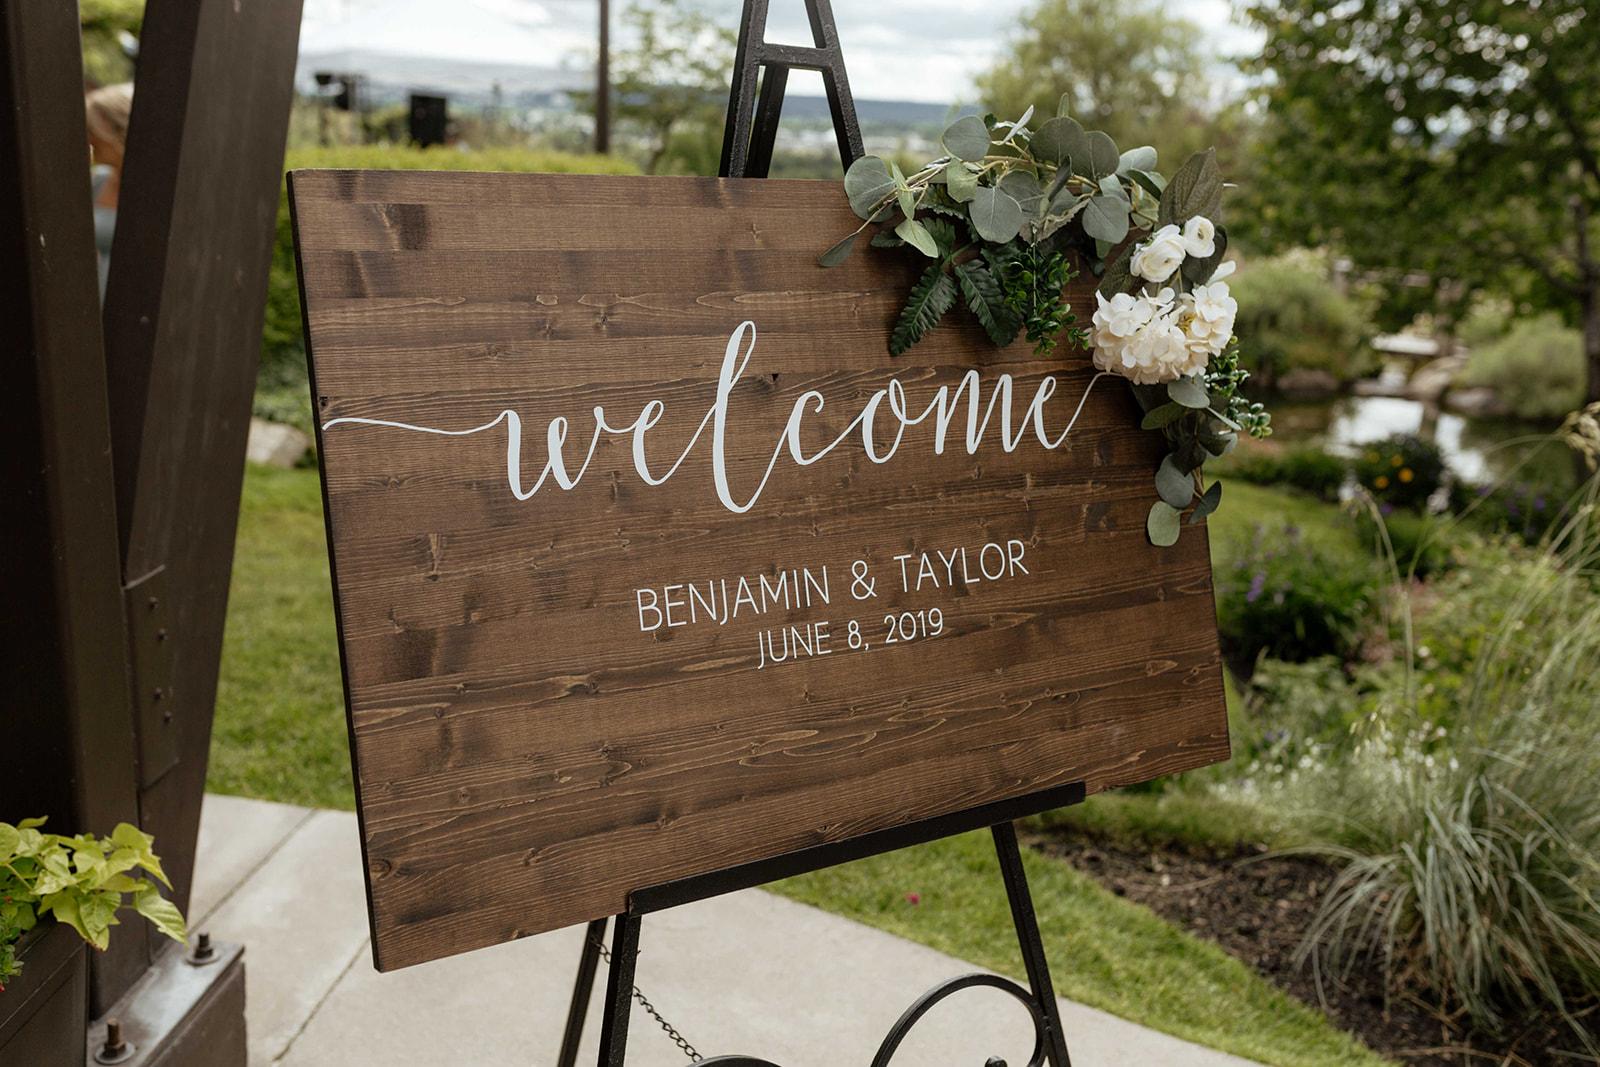 beacon hill wedding honest in ivory dress spokane welcome sign